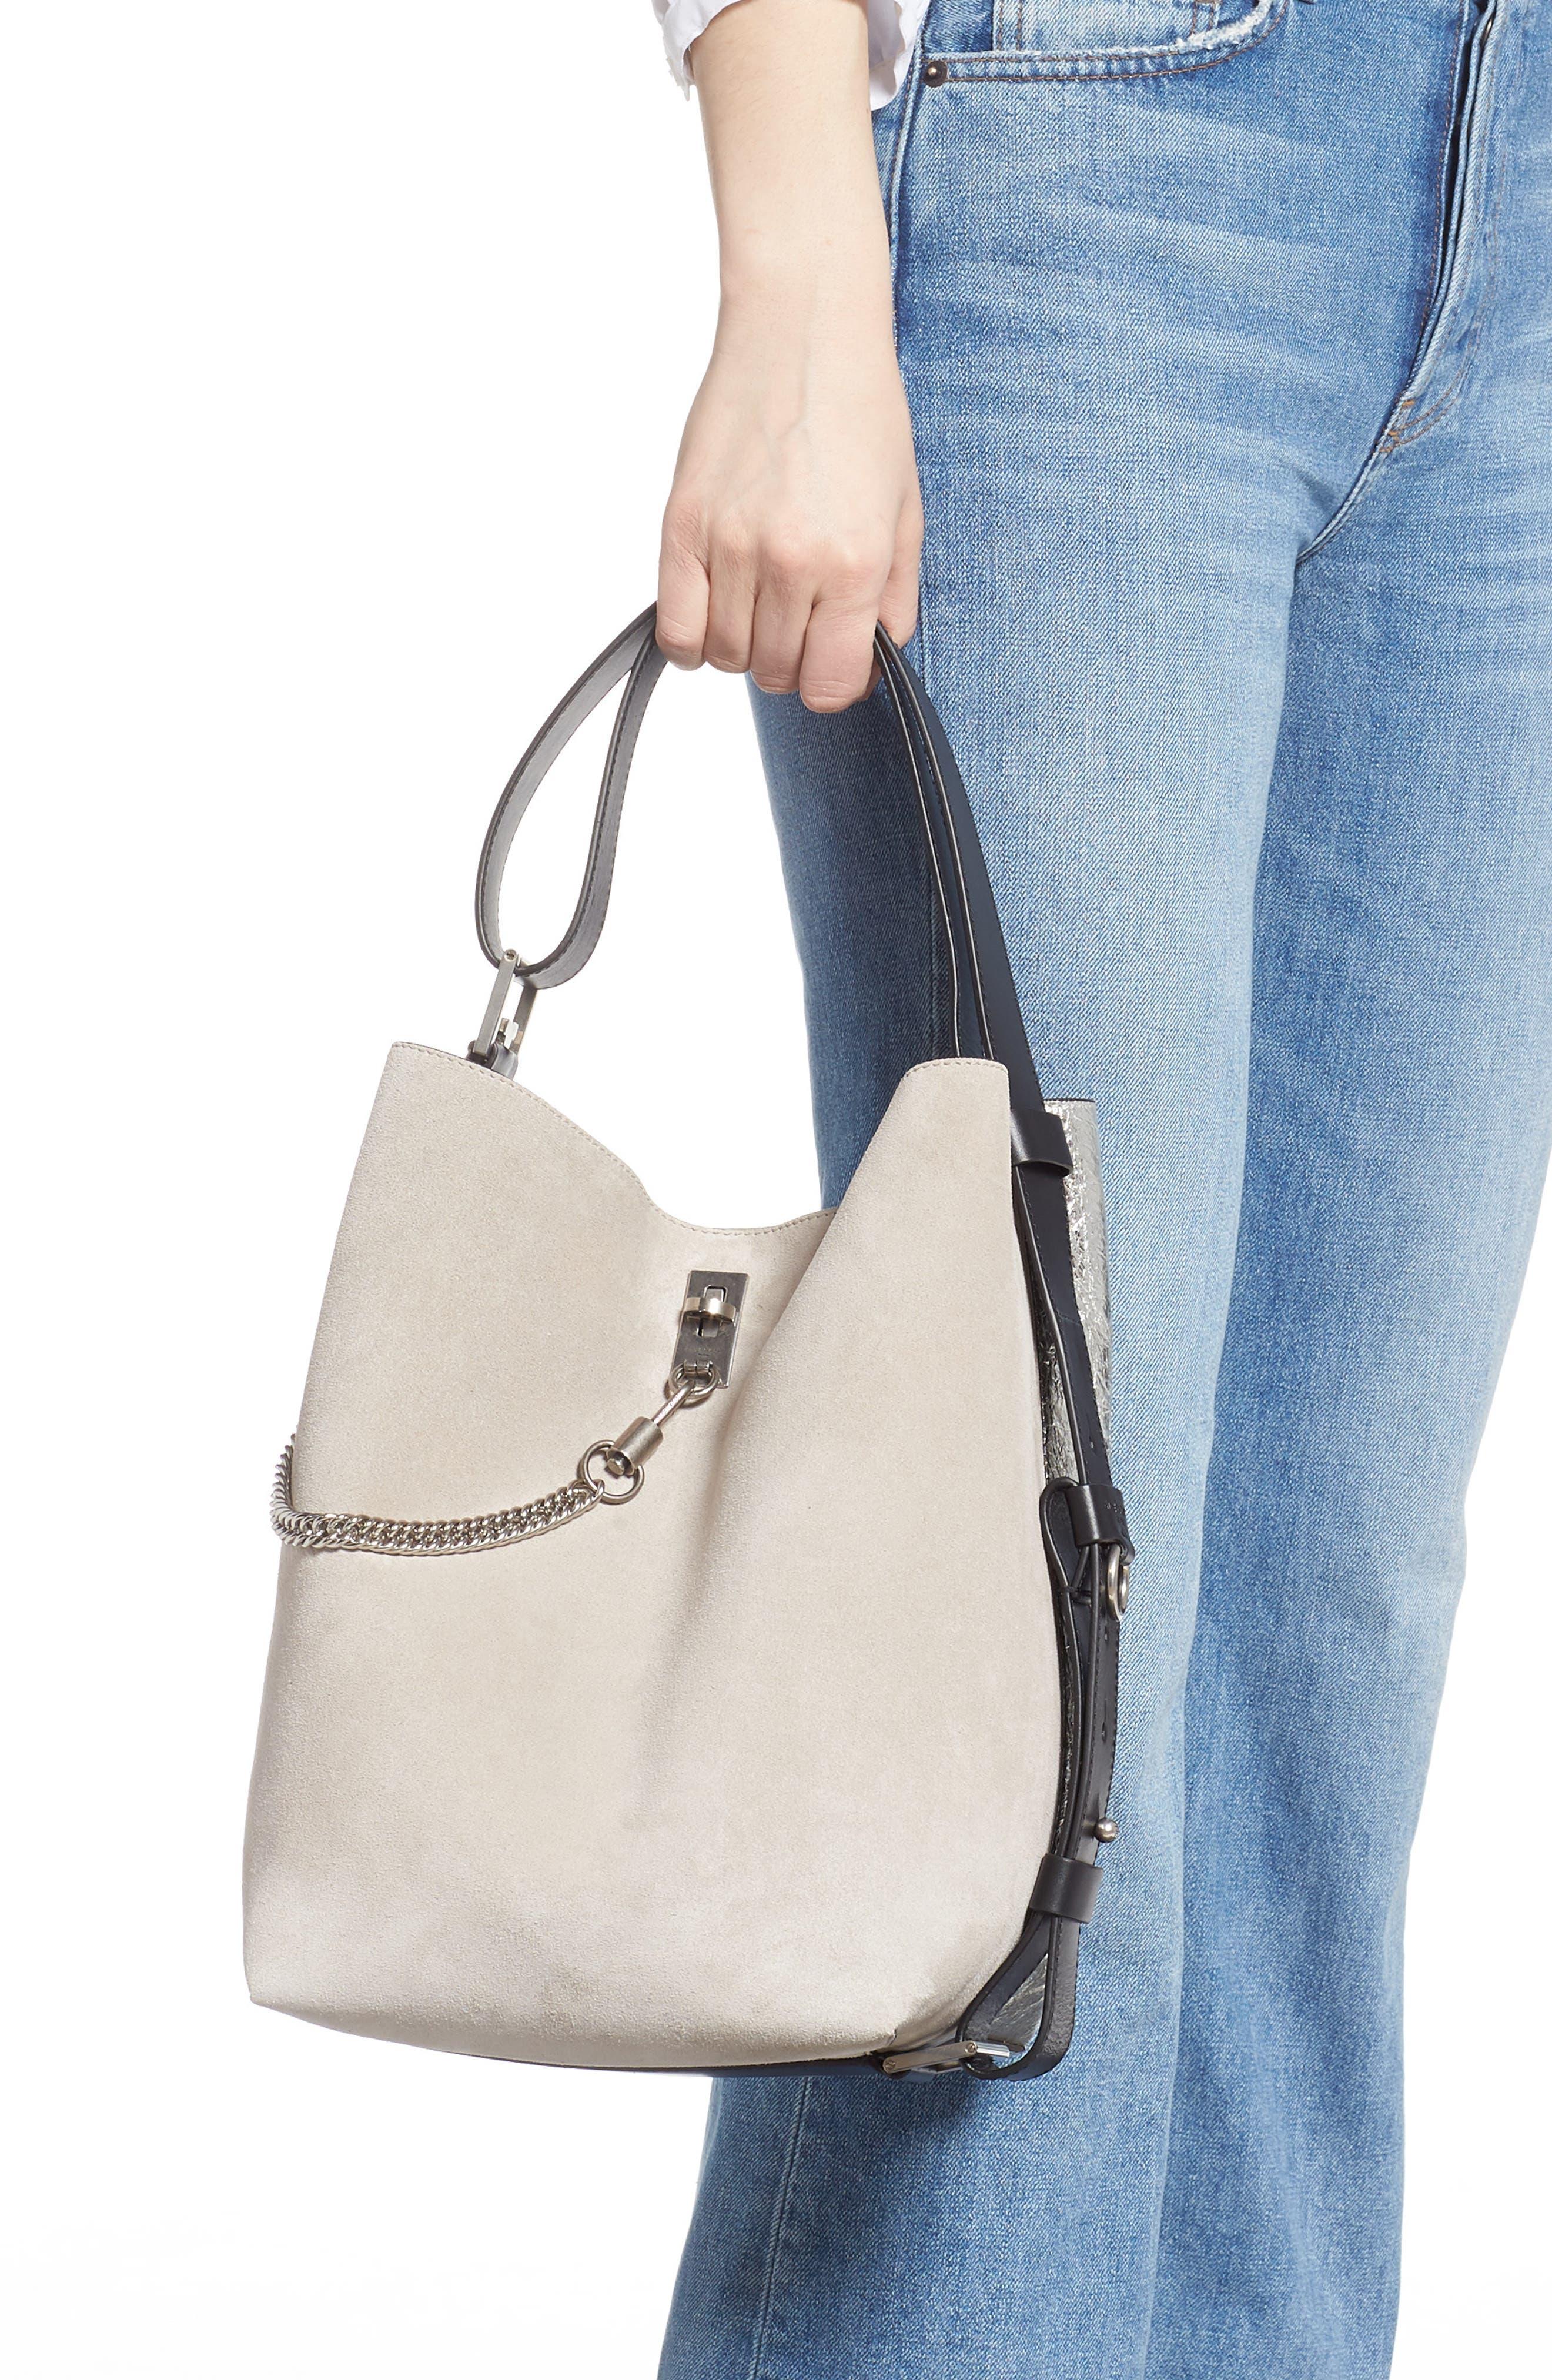 GIVENCHY, Medium GV Calfskin Suede Bucket Bag, Alternate thumbnail 2, color, NATURAL/ SILVER